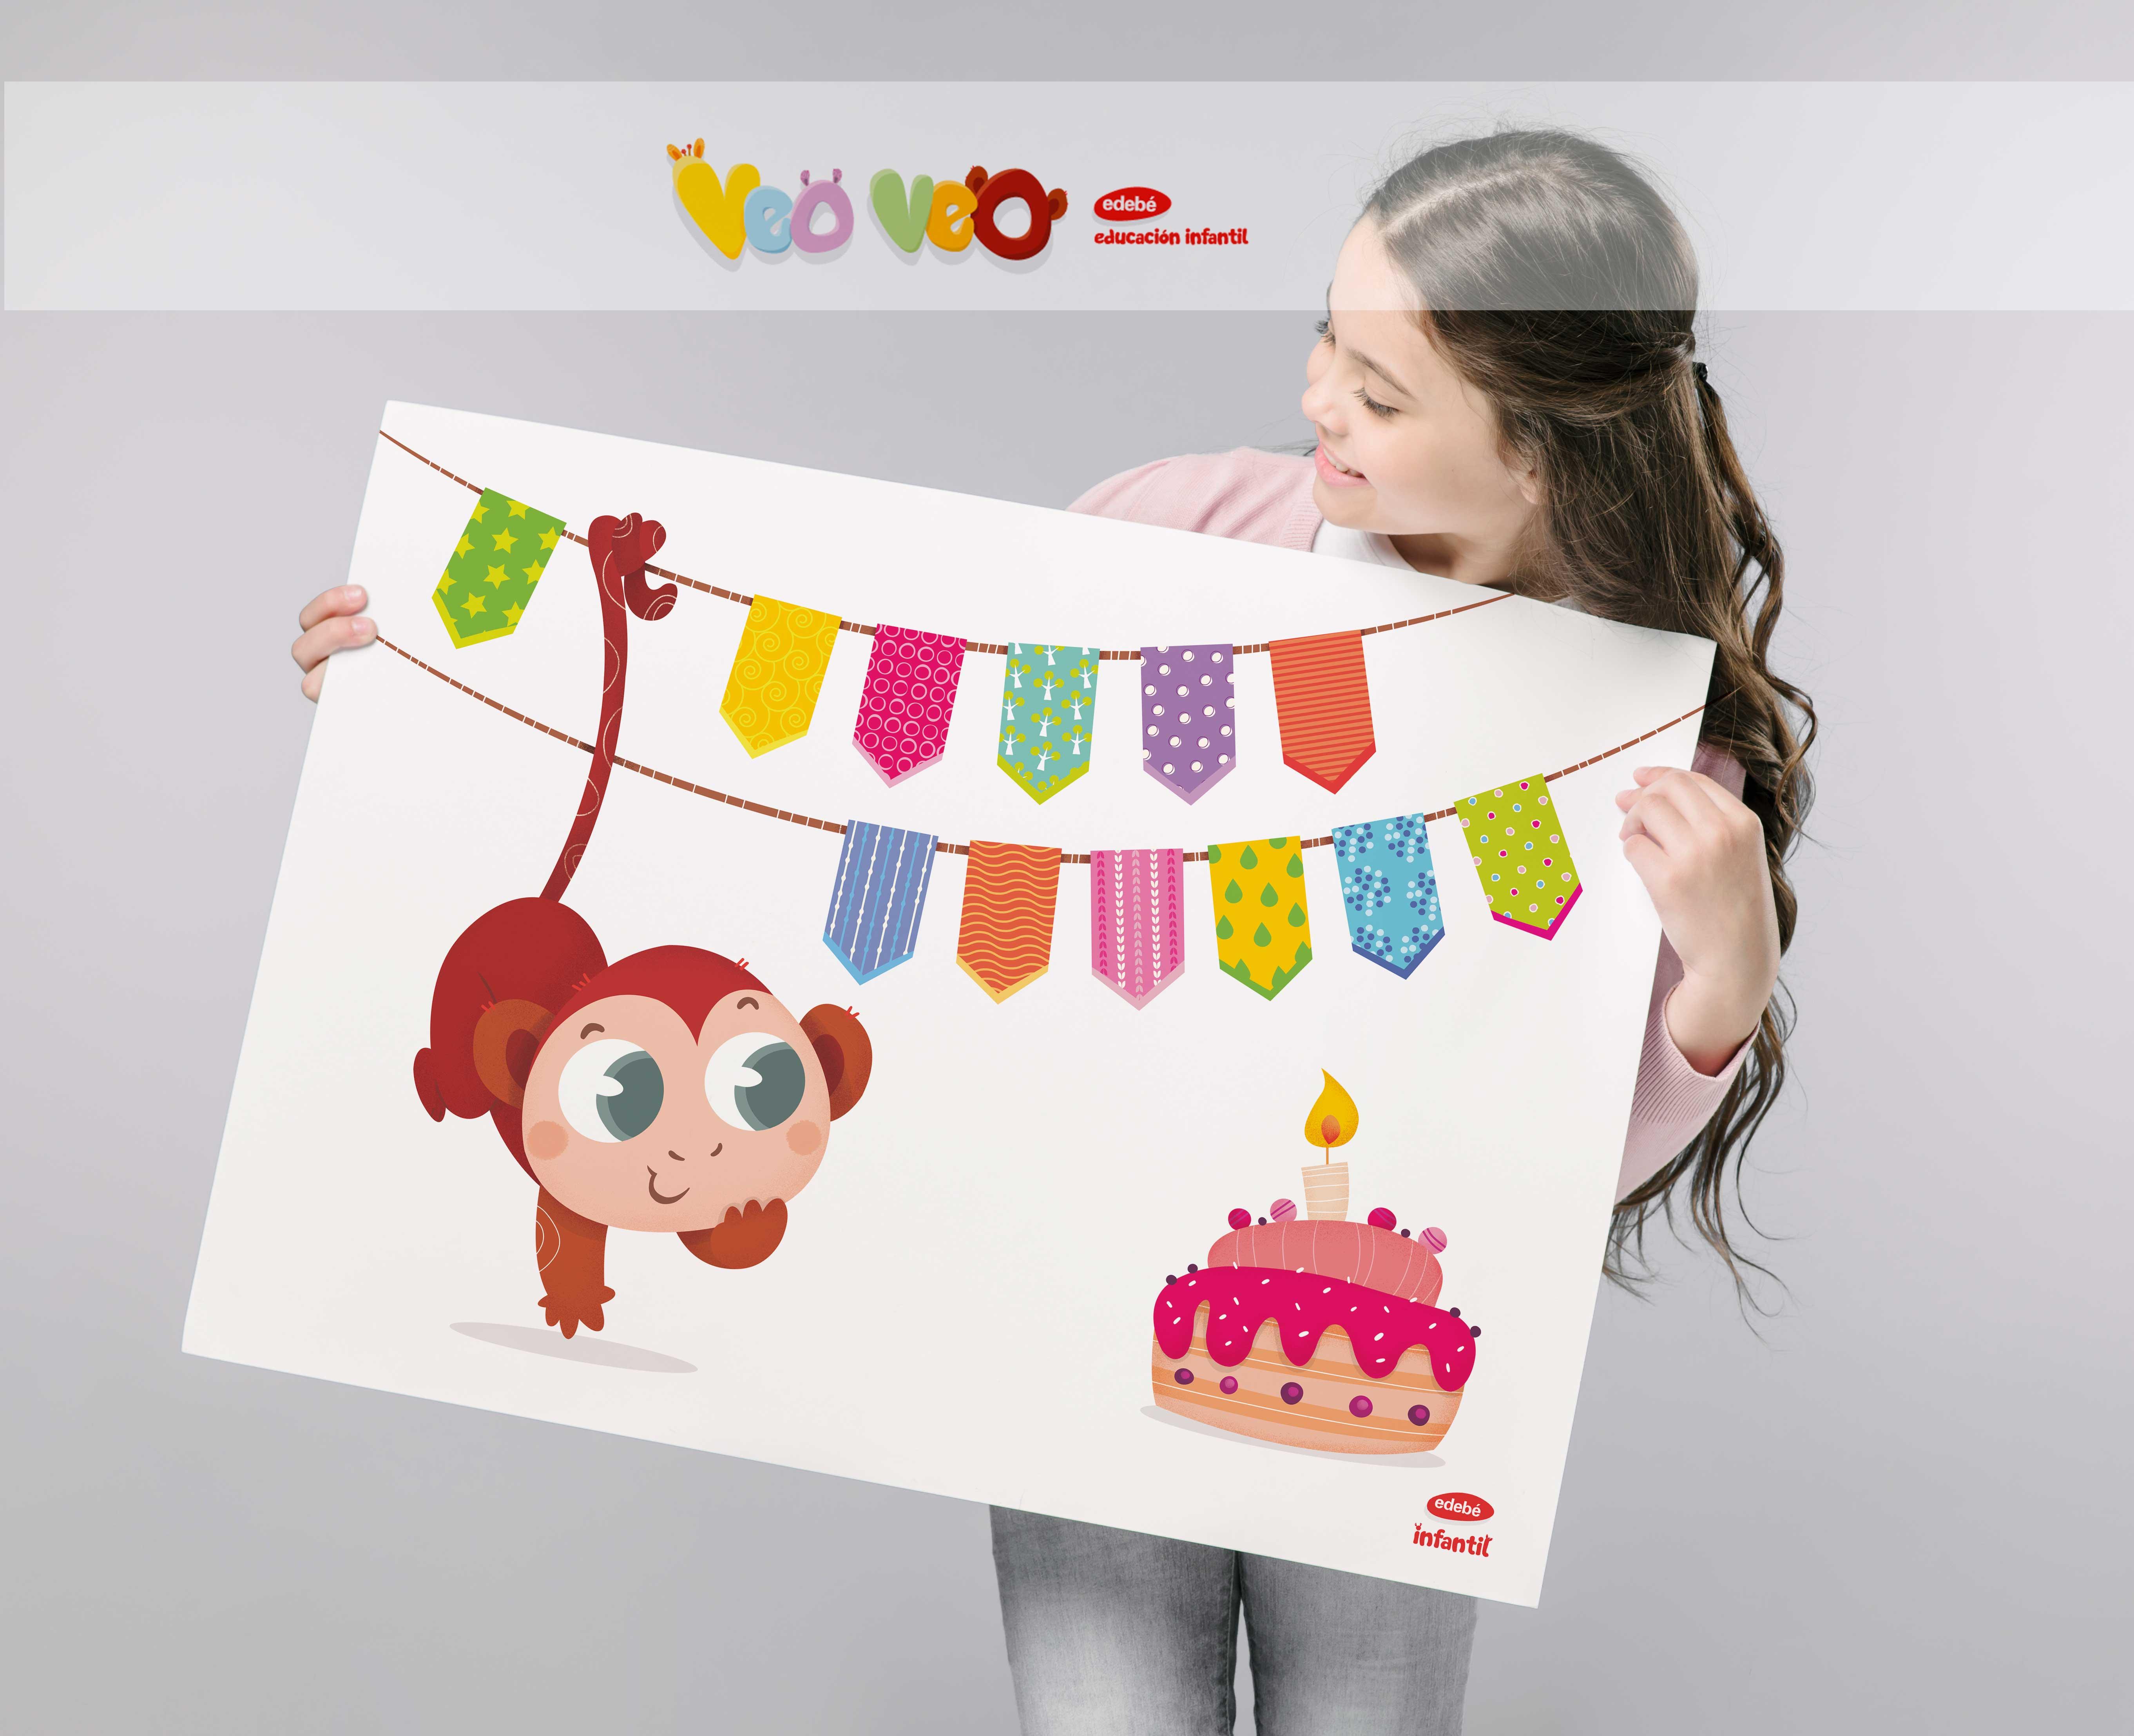 mural_cumpleaños_tico_children_illustration_veo_veo